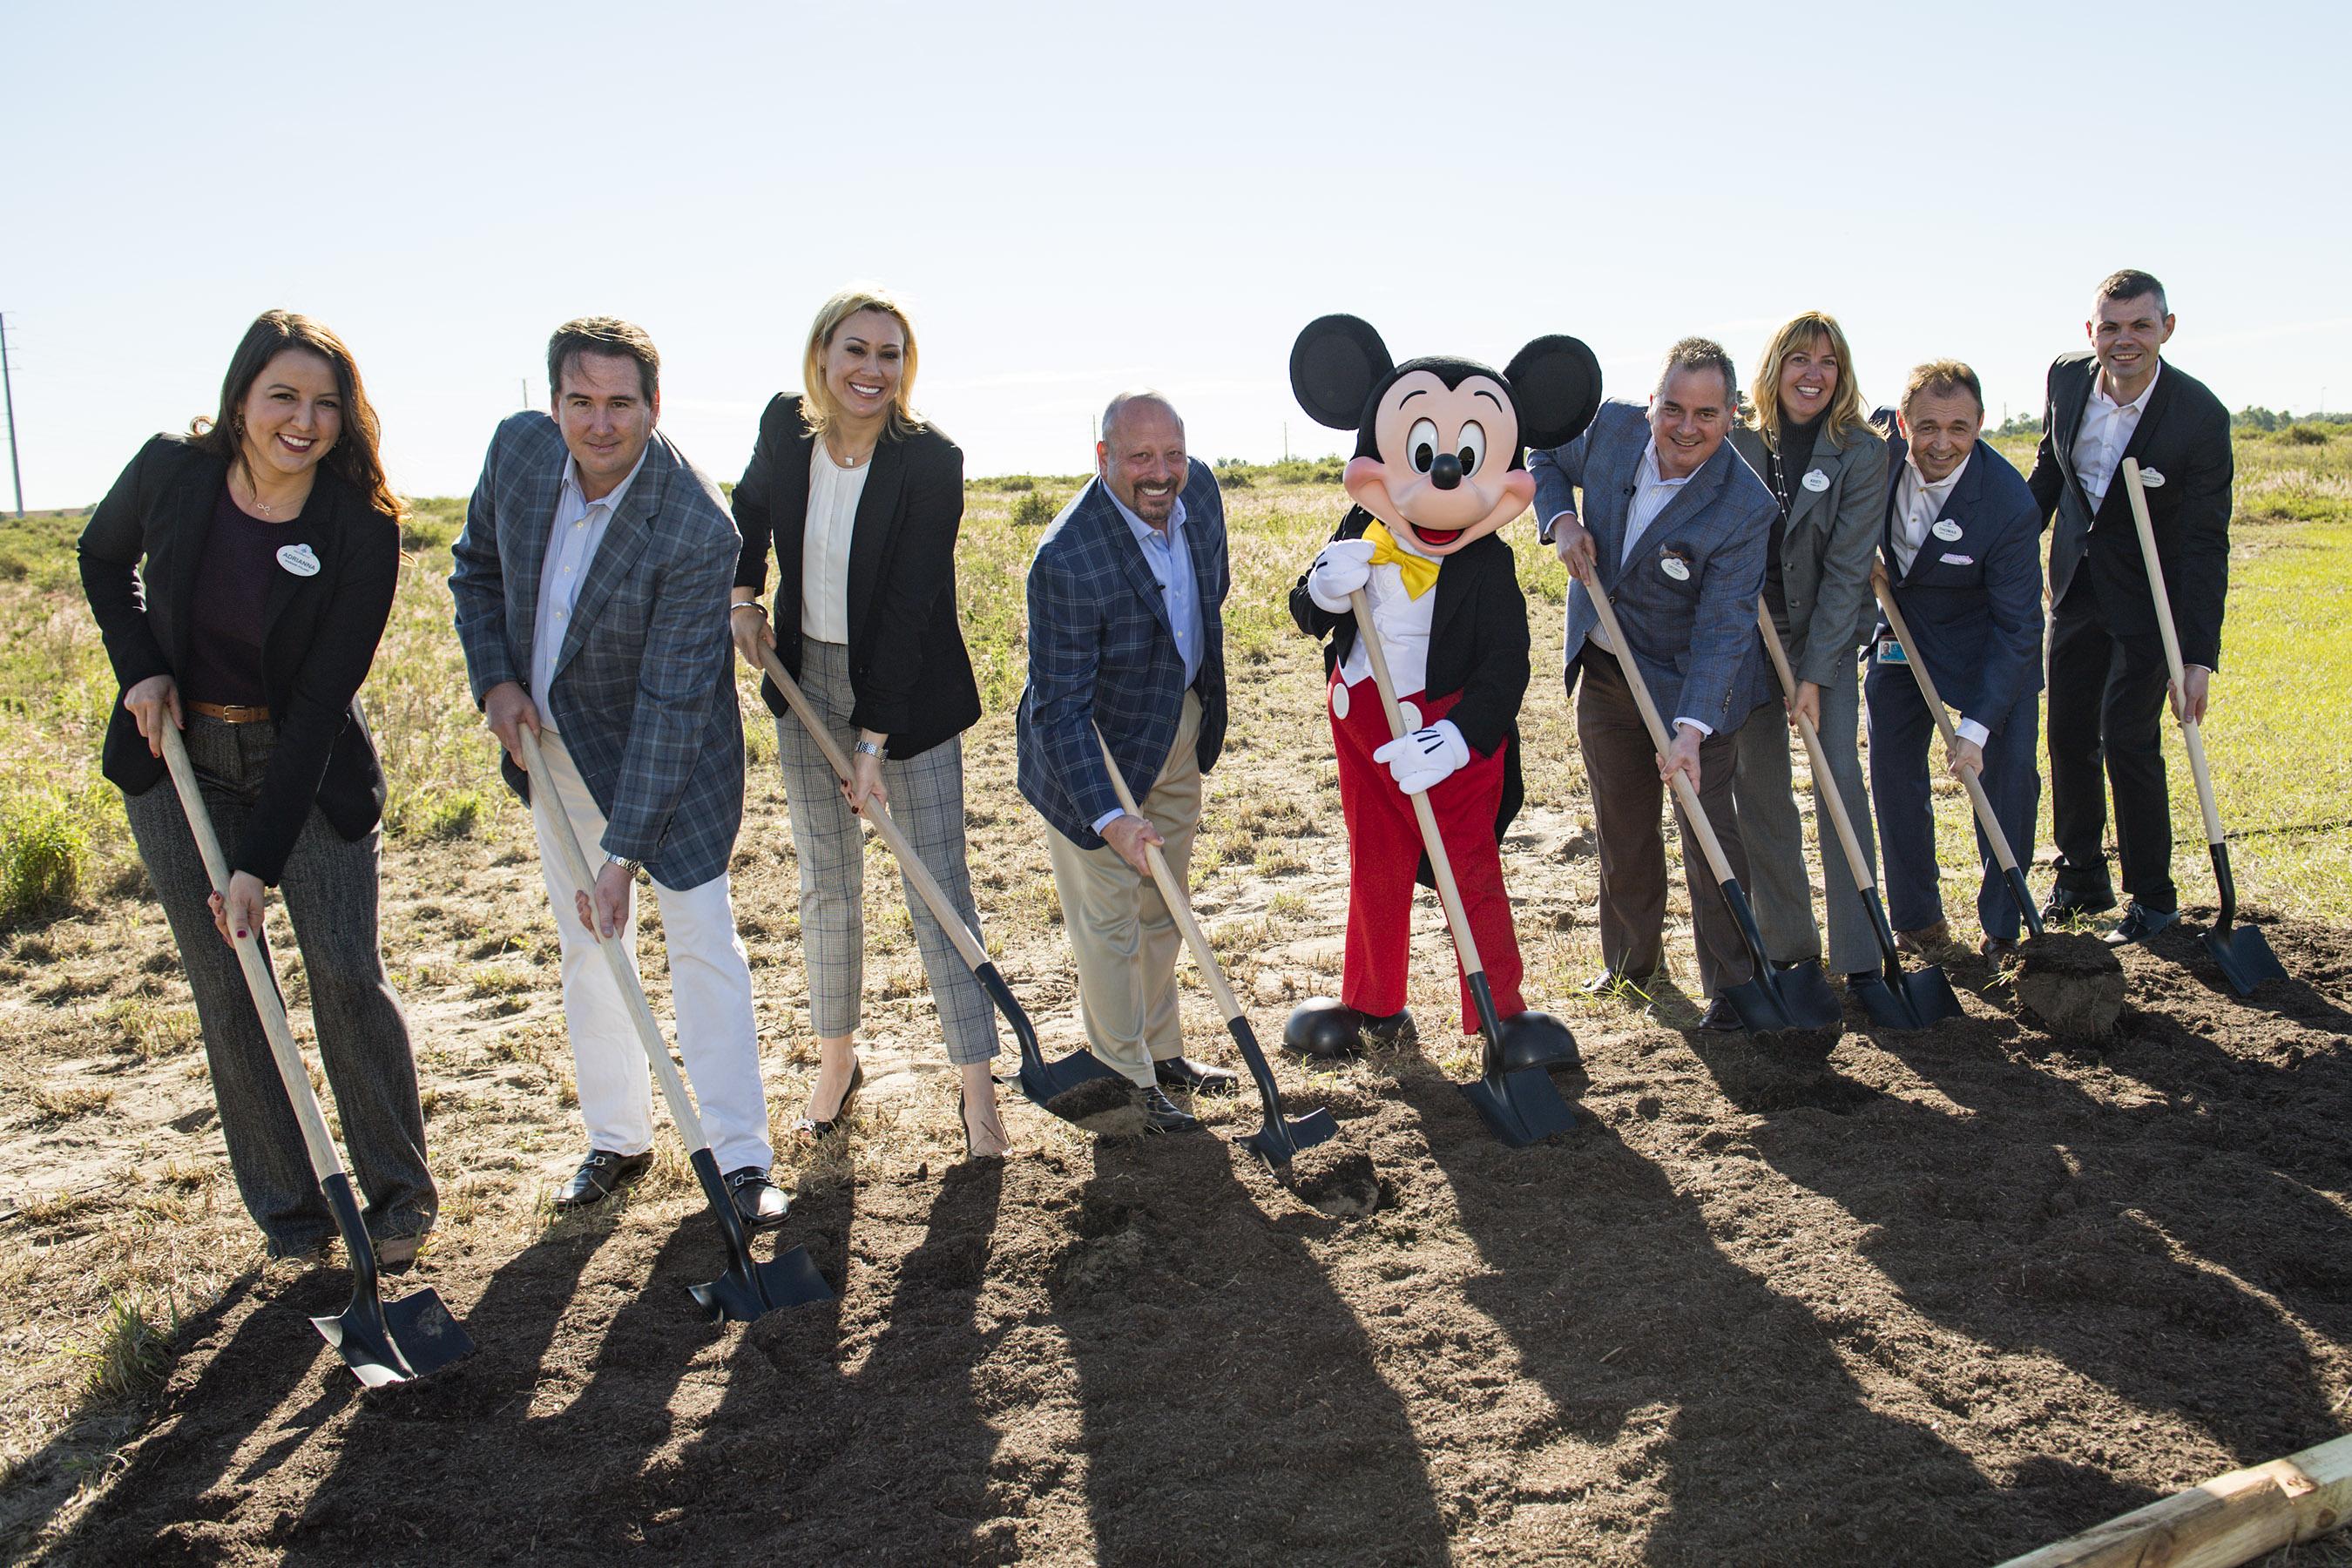 Walt Disney World Begins Construction Of New Housing